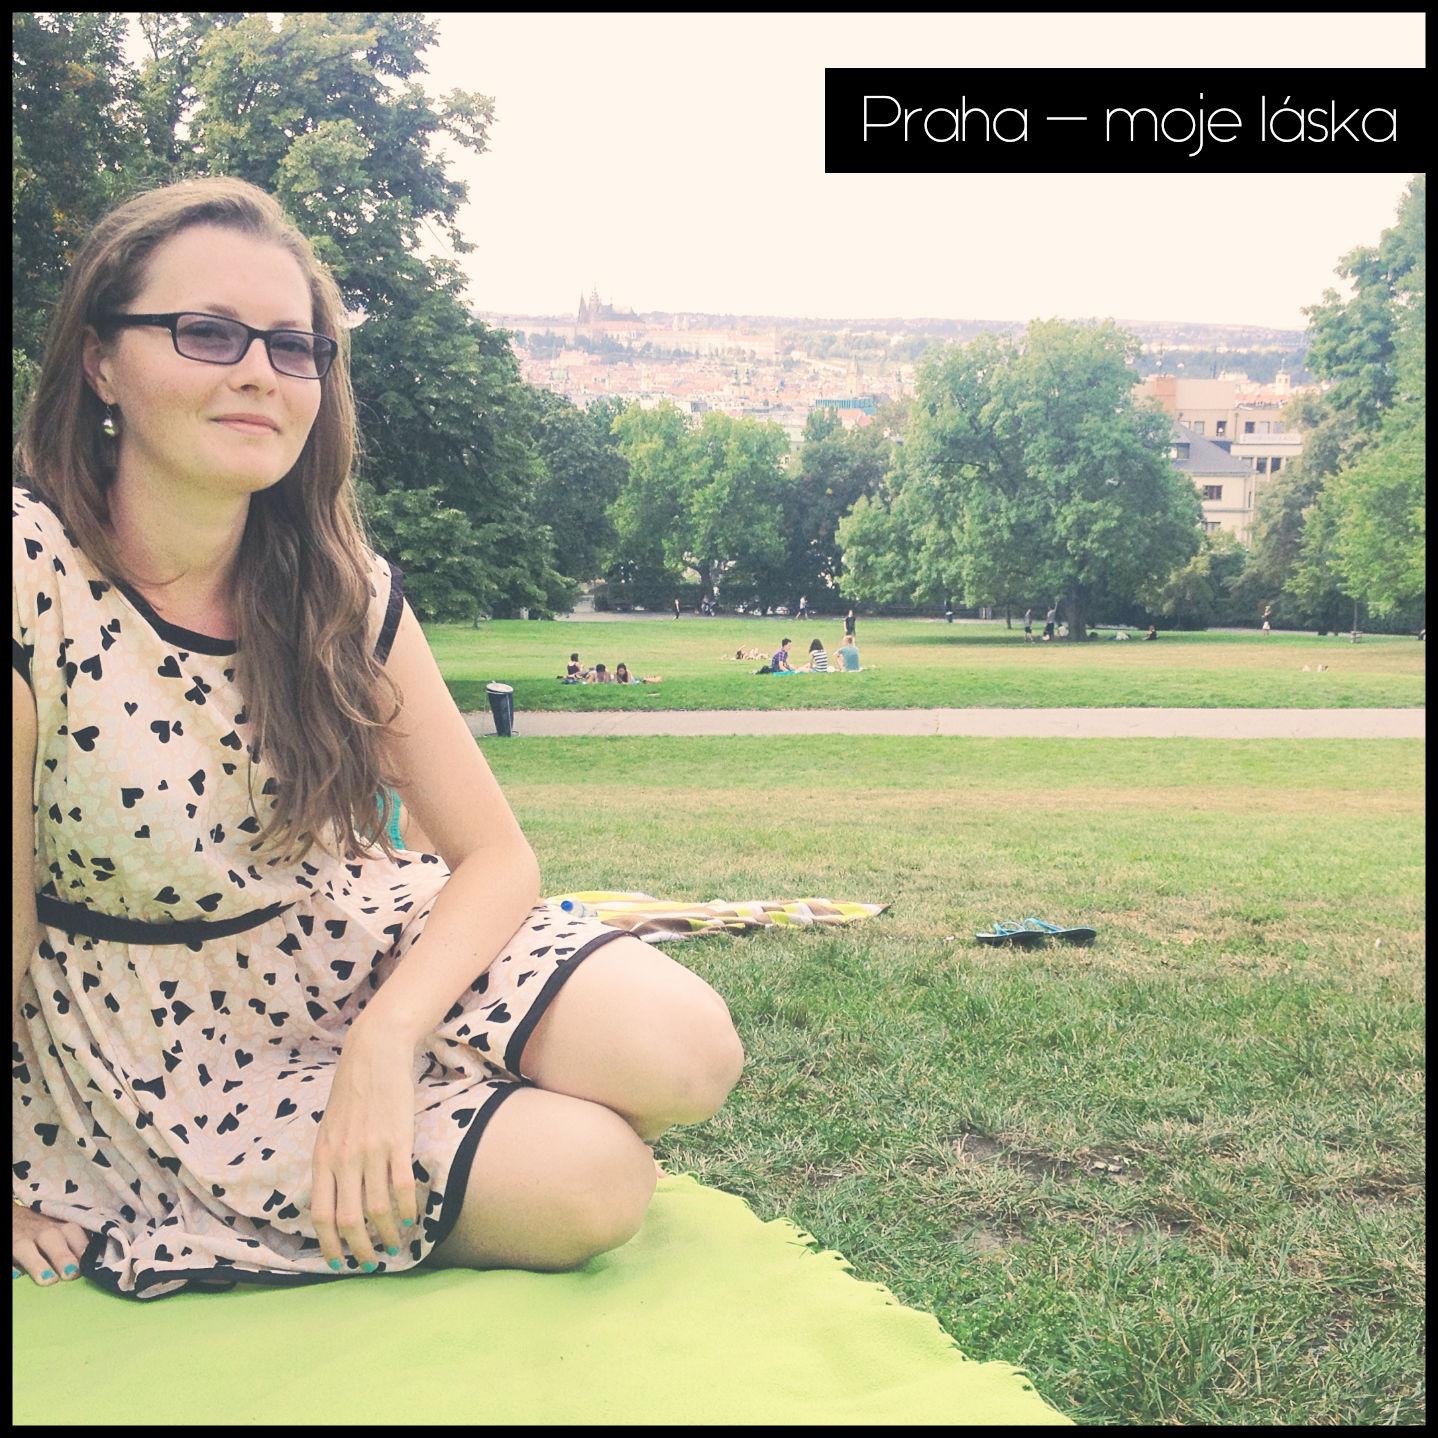 Praga parkami stoi